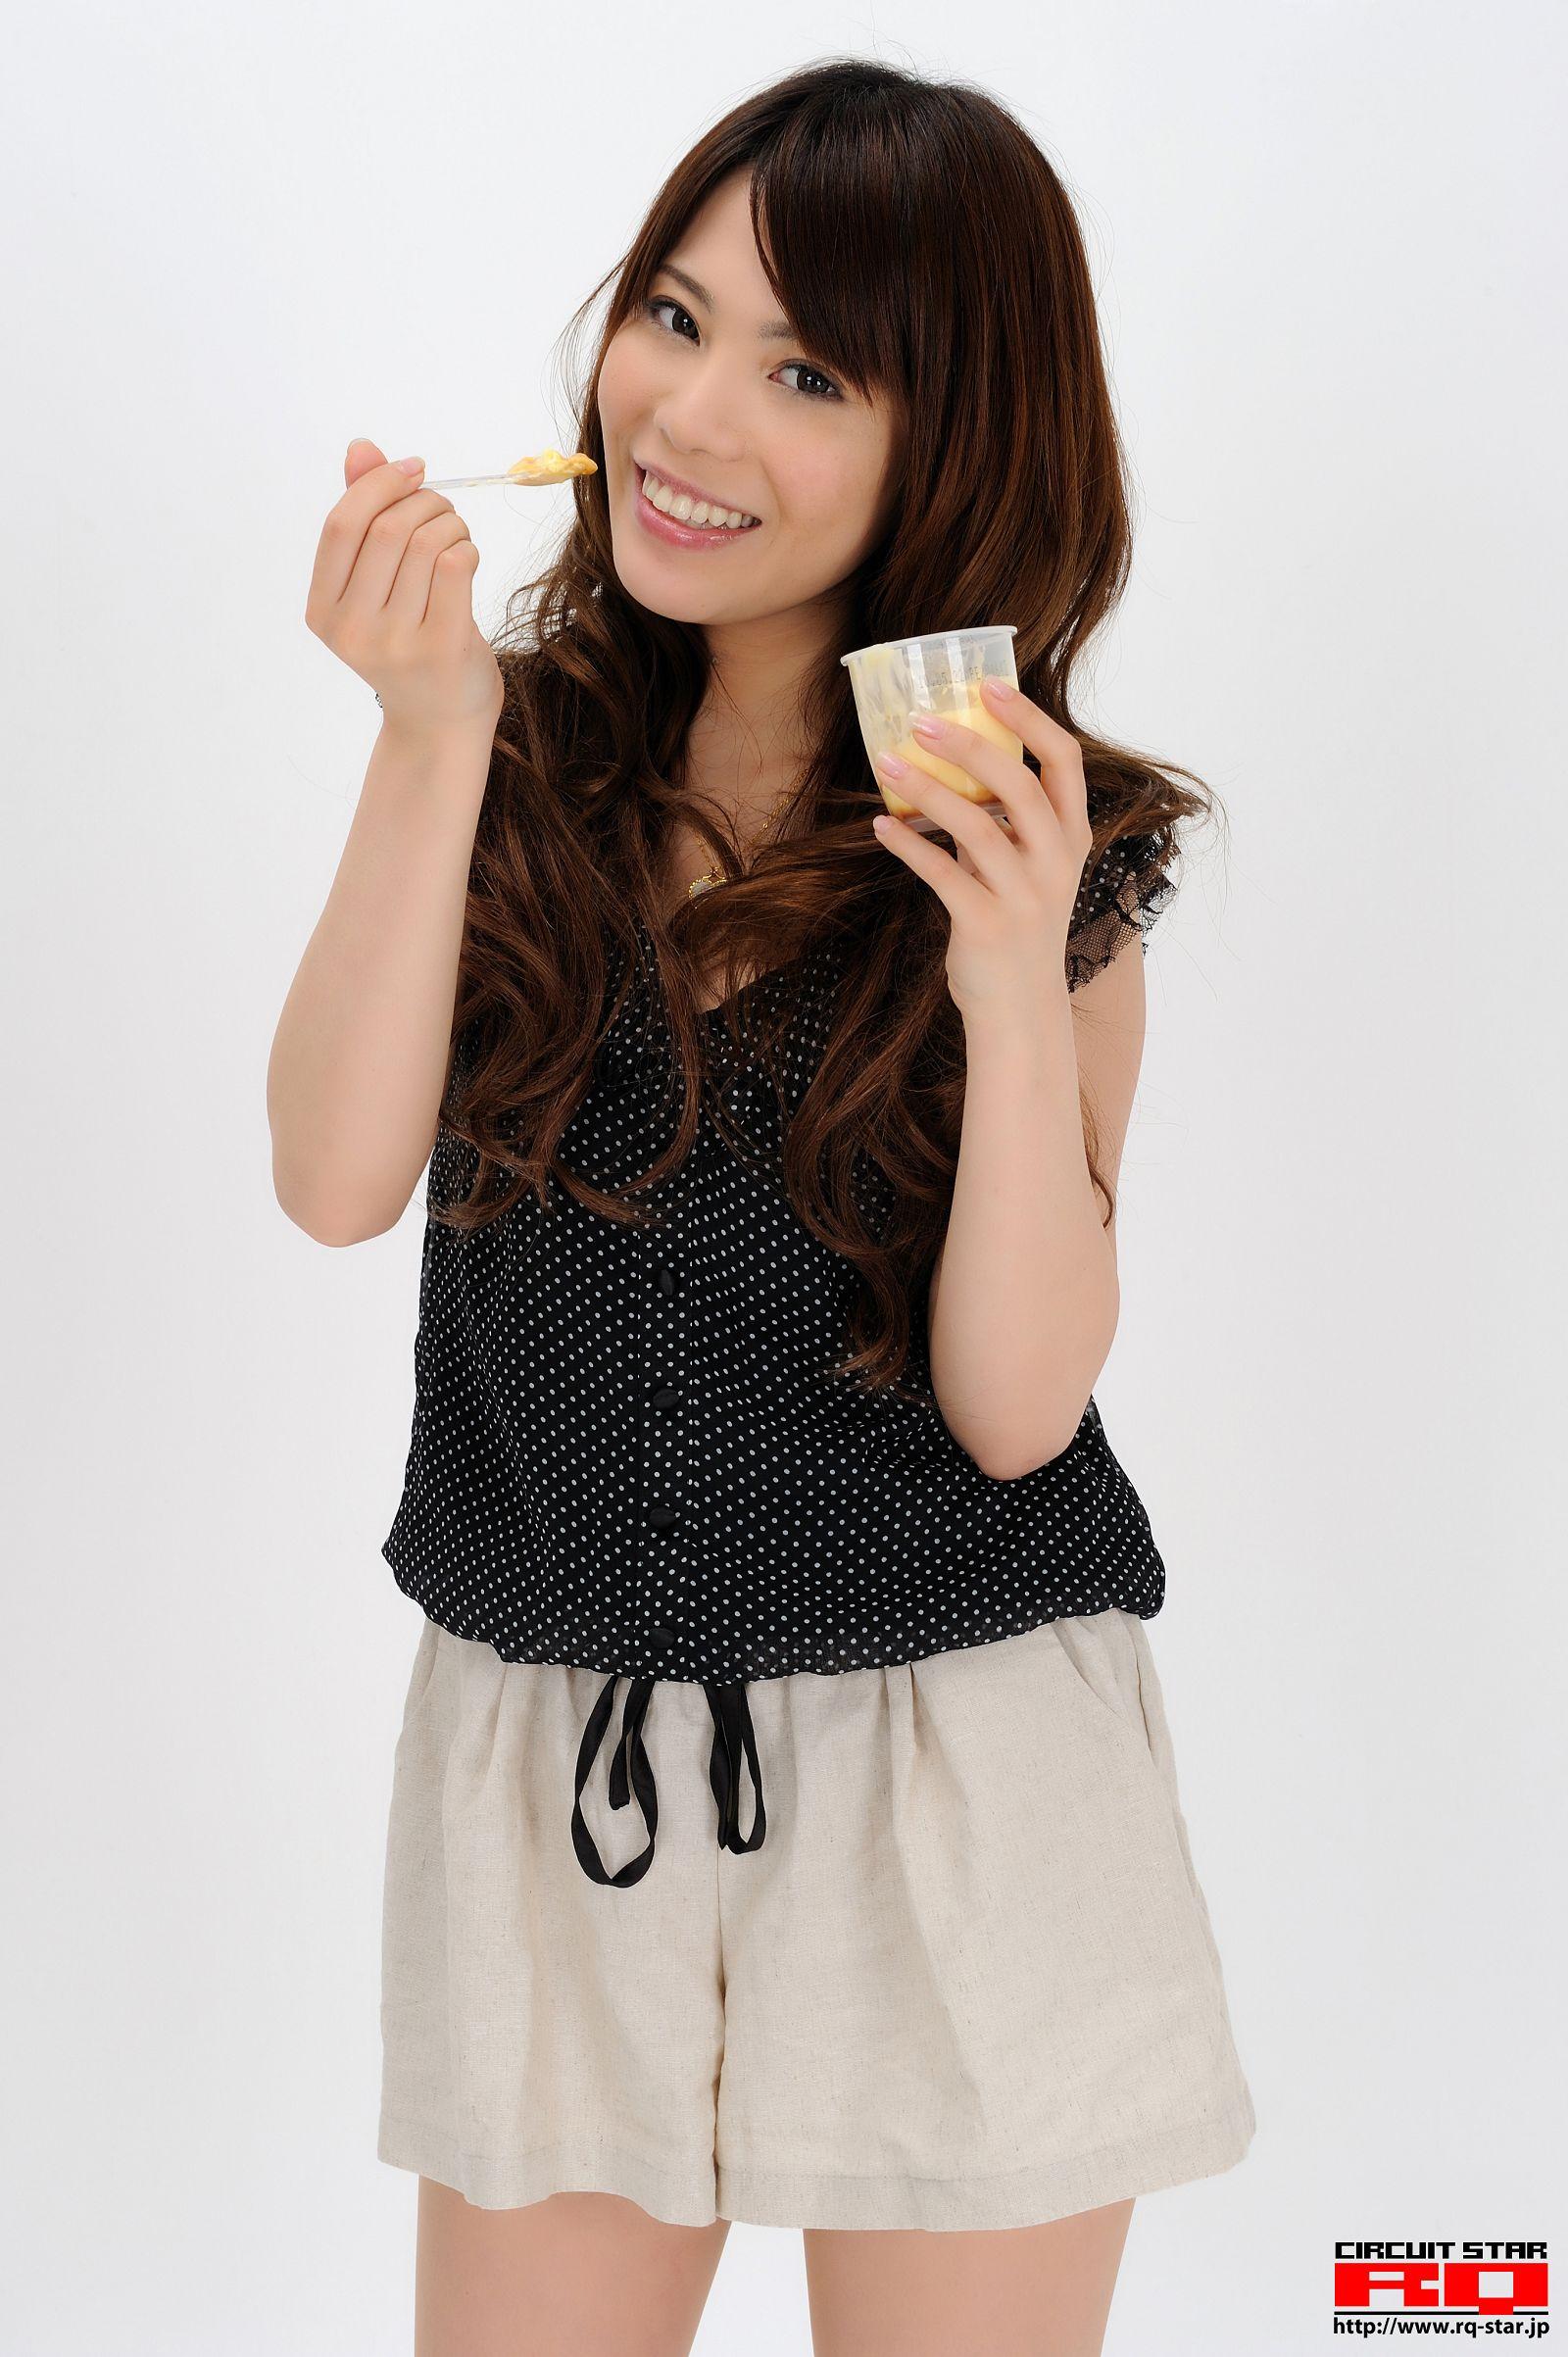 [RQ STAR美女] NO.0291 Takana Honda 本田貴奈 Private Dress[80P] RQ STAR 第2张